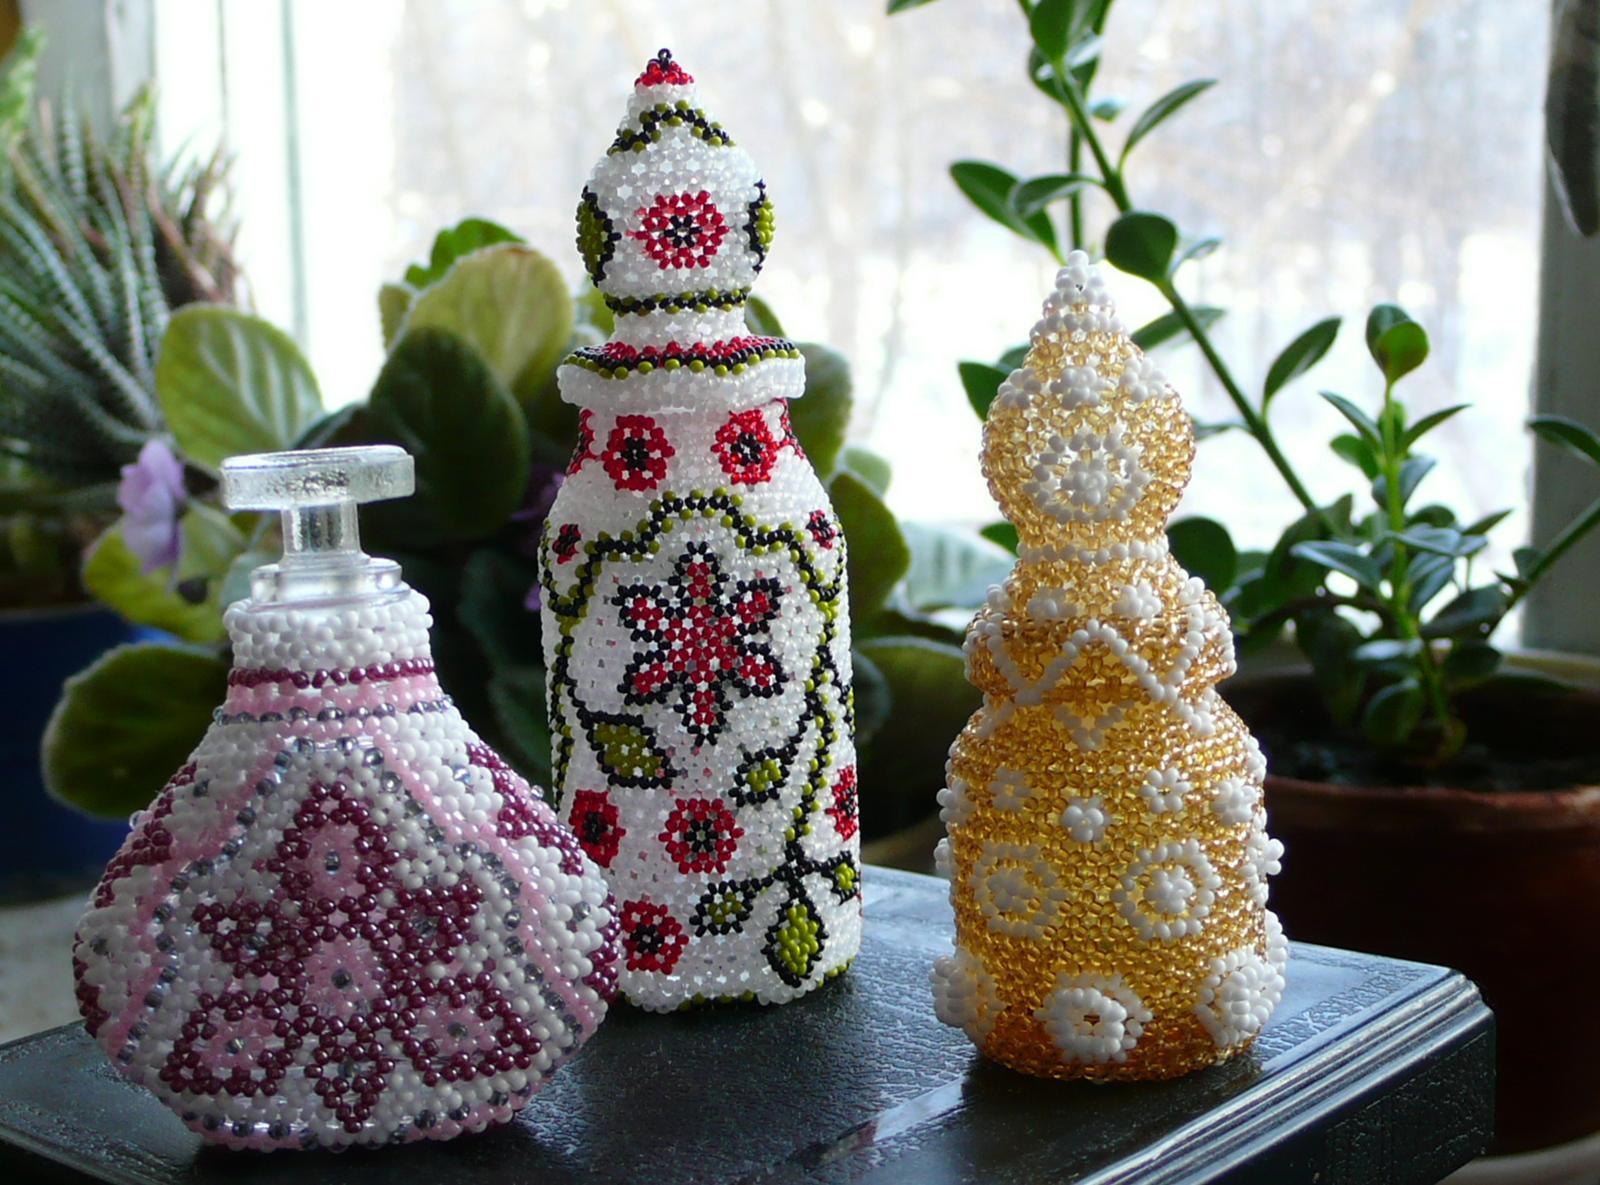 Бутылки, обшитые бисером